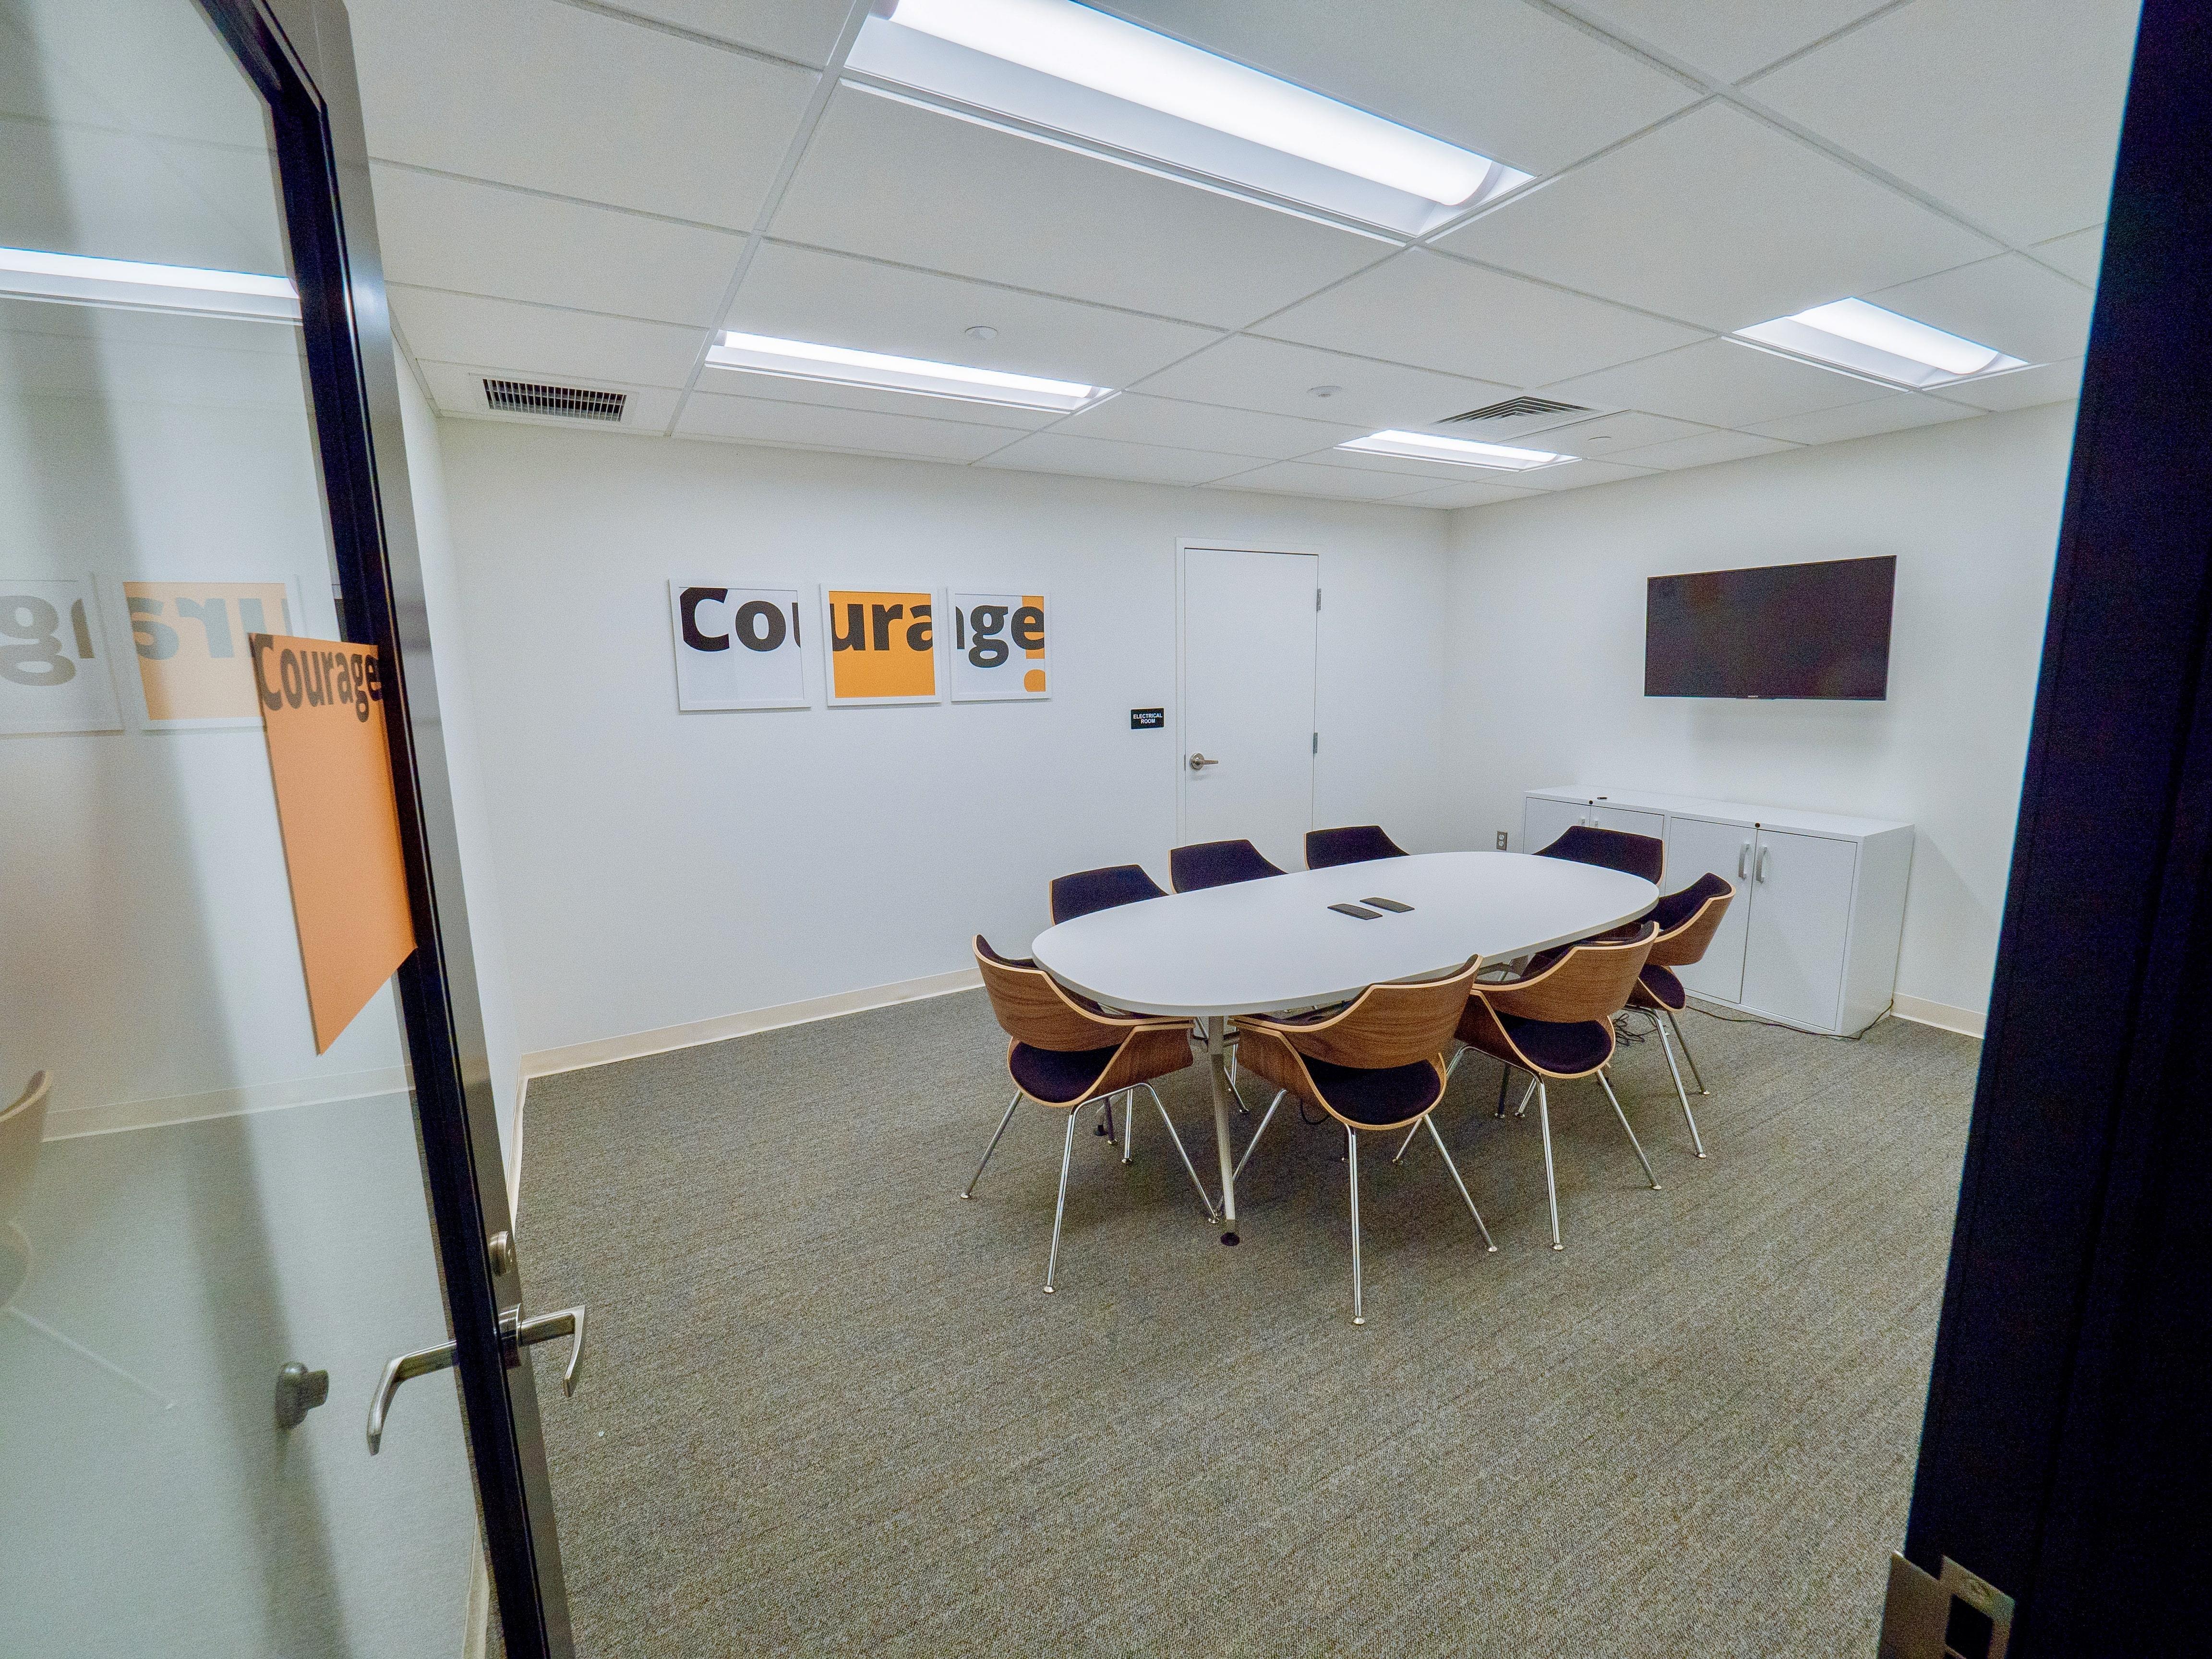 Upward Hartford - Courage Conference Room